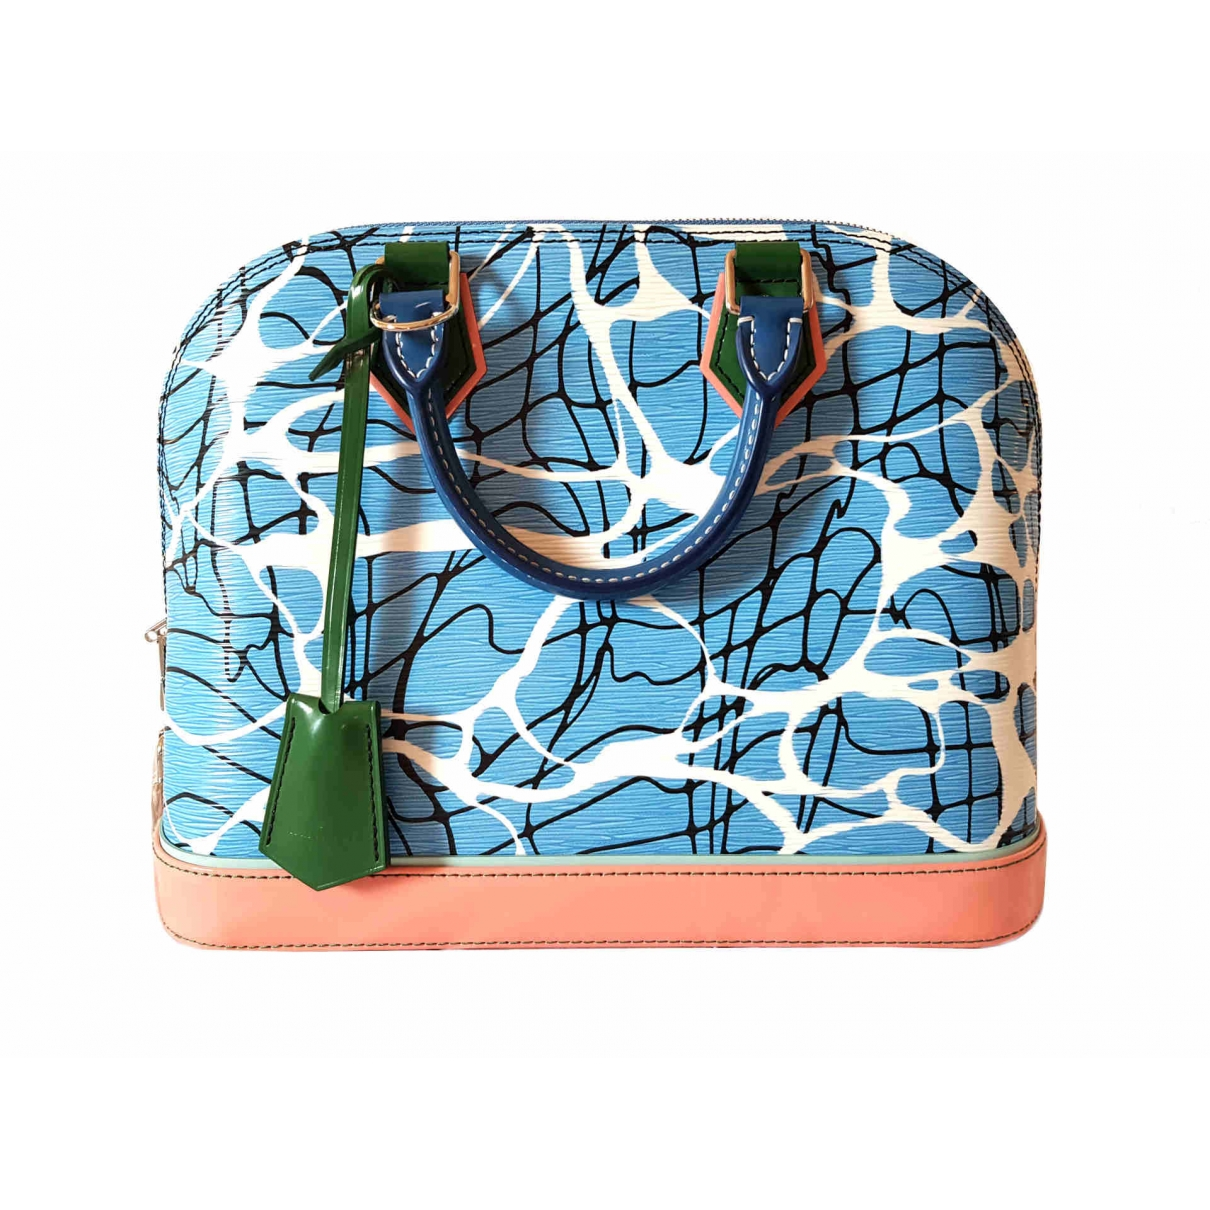 Louis Vuitton - Sac a main Alma pour femme en cuir verni - turquoise